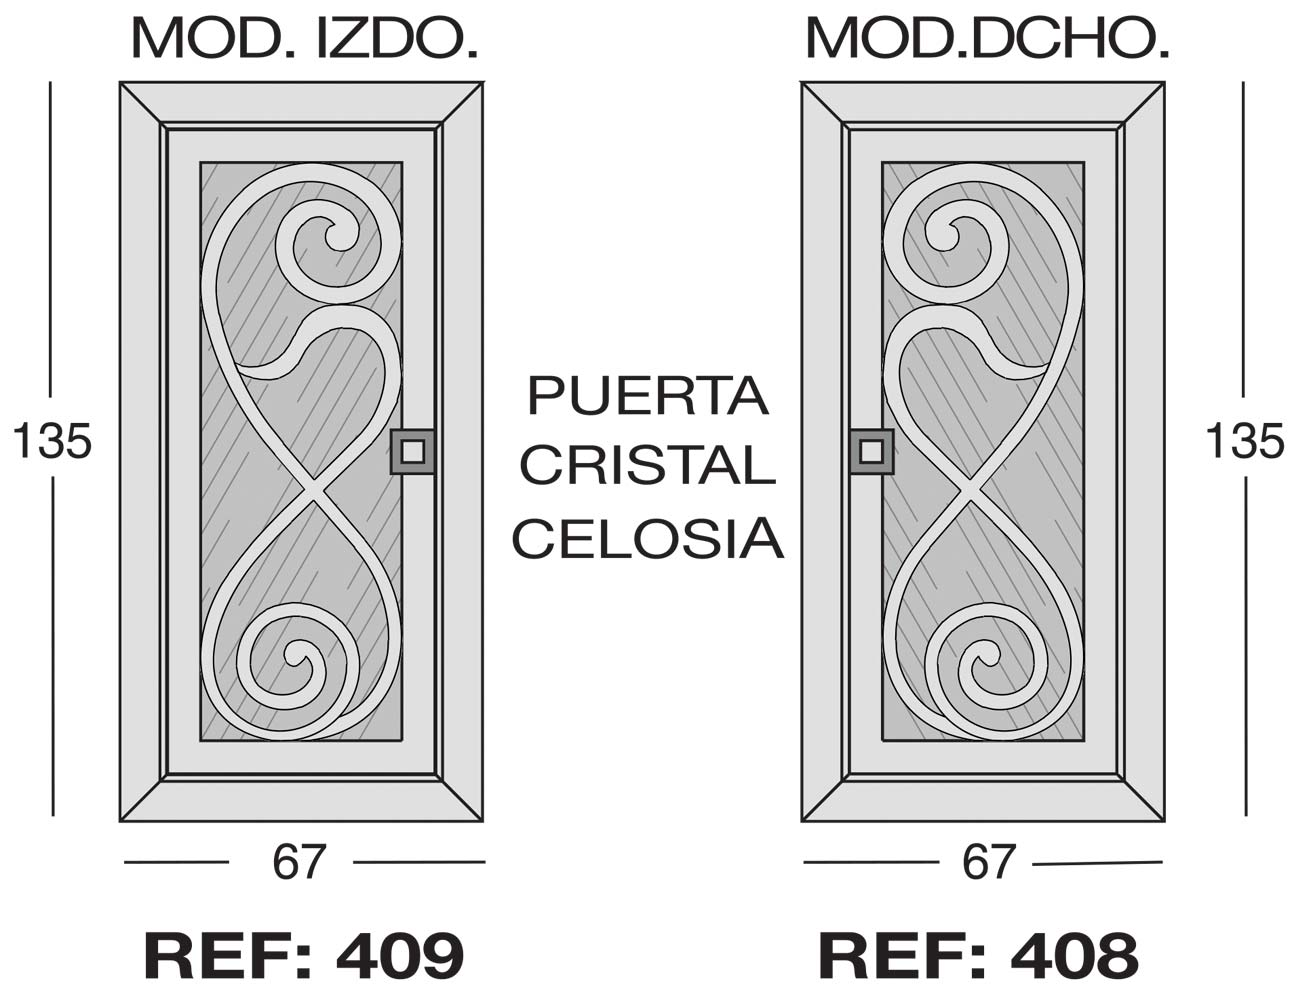 Modulo izdo 409 dcho 408 puerta cristal celosia